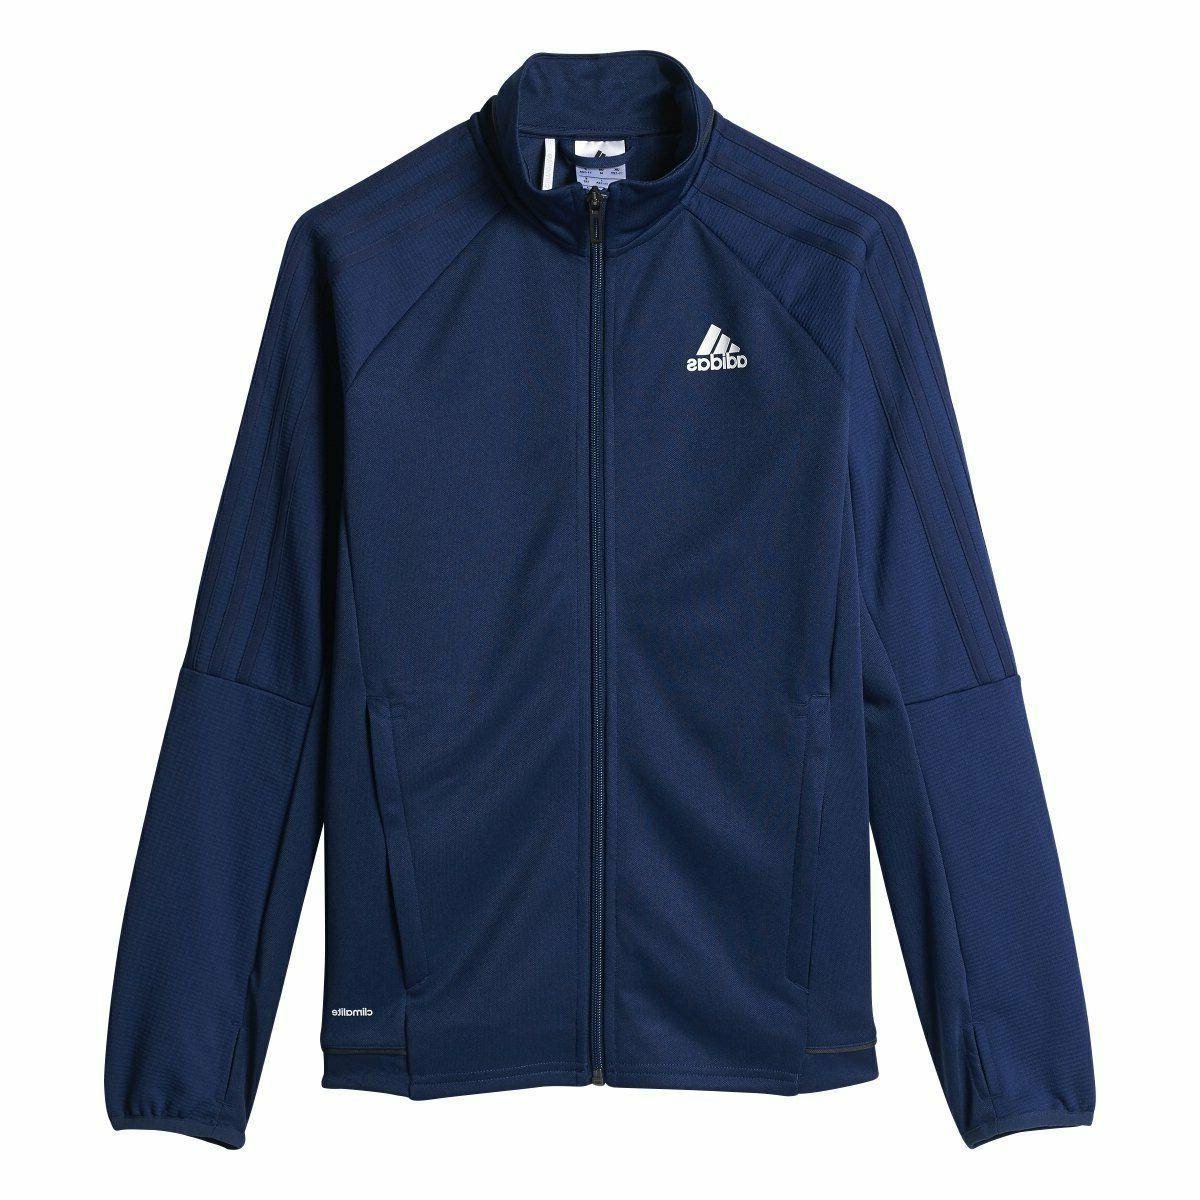 Adidas Training Jacket - BQ8199